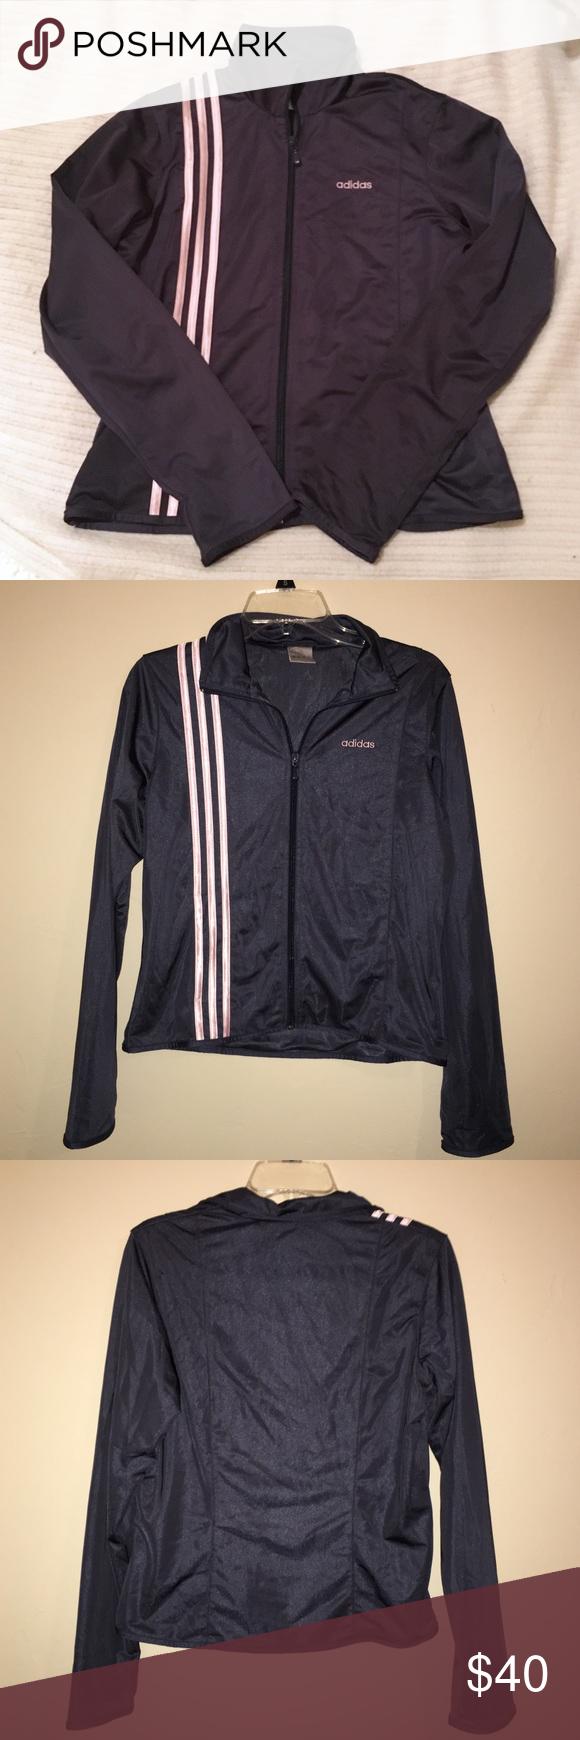 Adidas jacket black pink stripes sz med whood